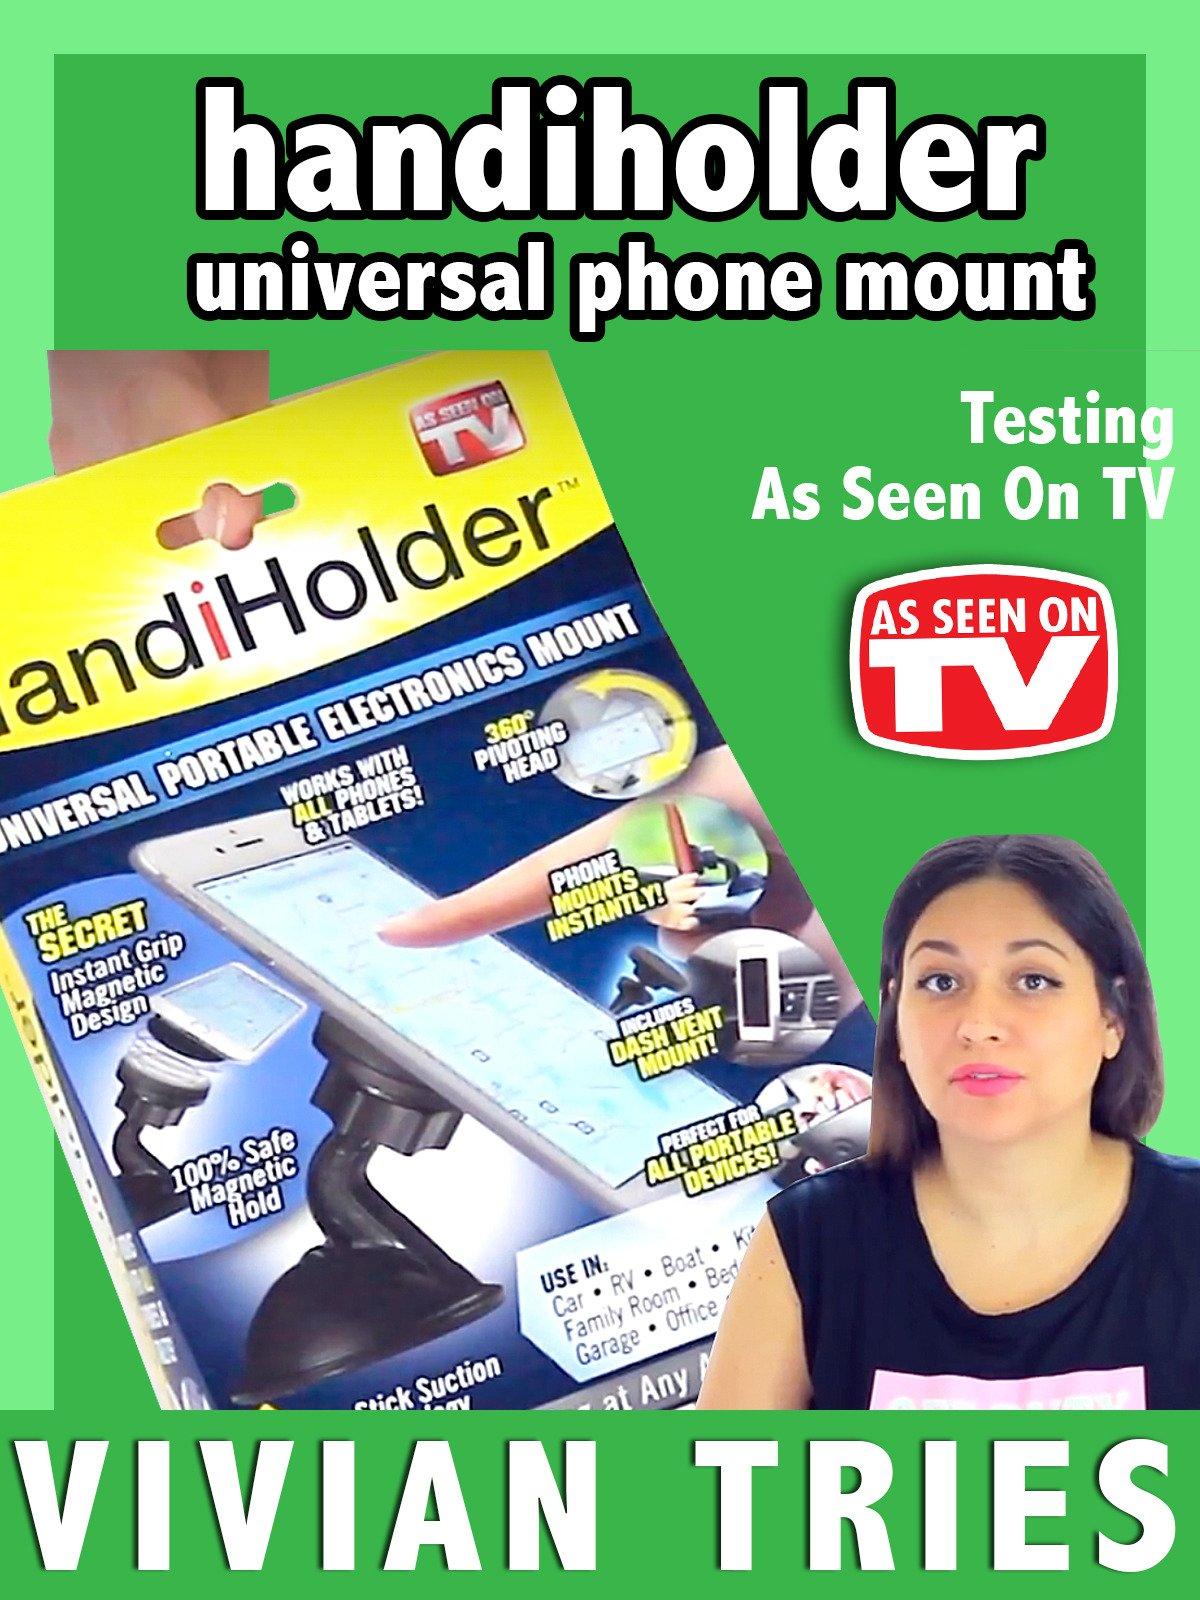 Review: Handiholder universal phone mount